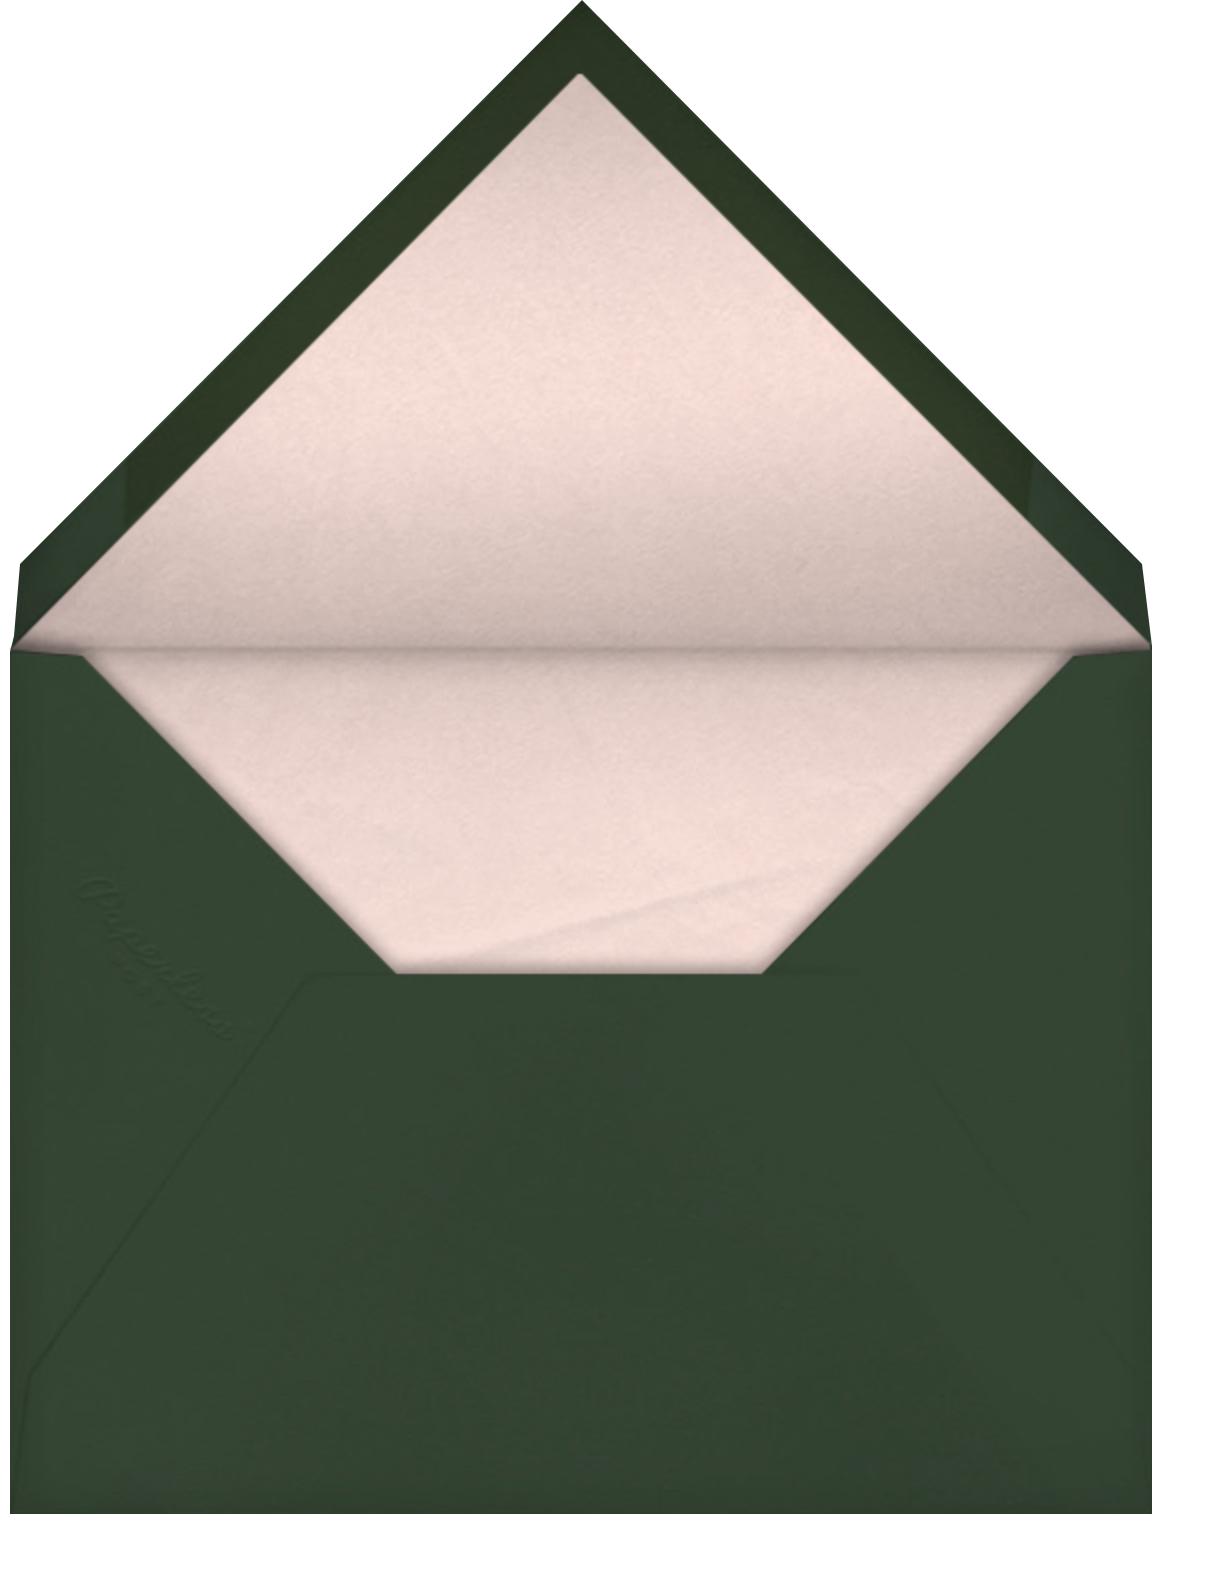 Cortile (Square) - Venamour - Adult birthday - envelope back